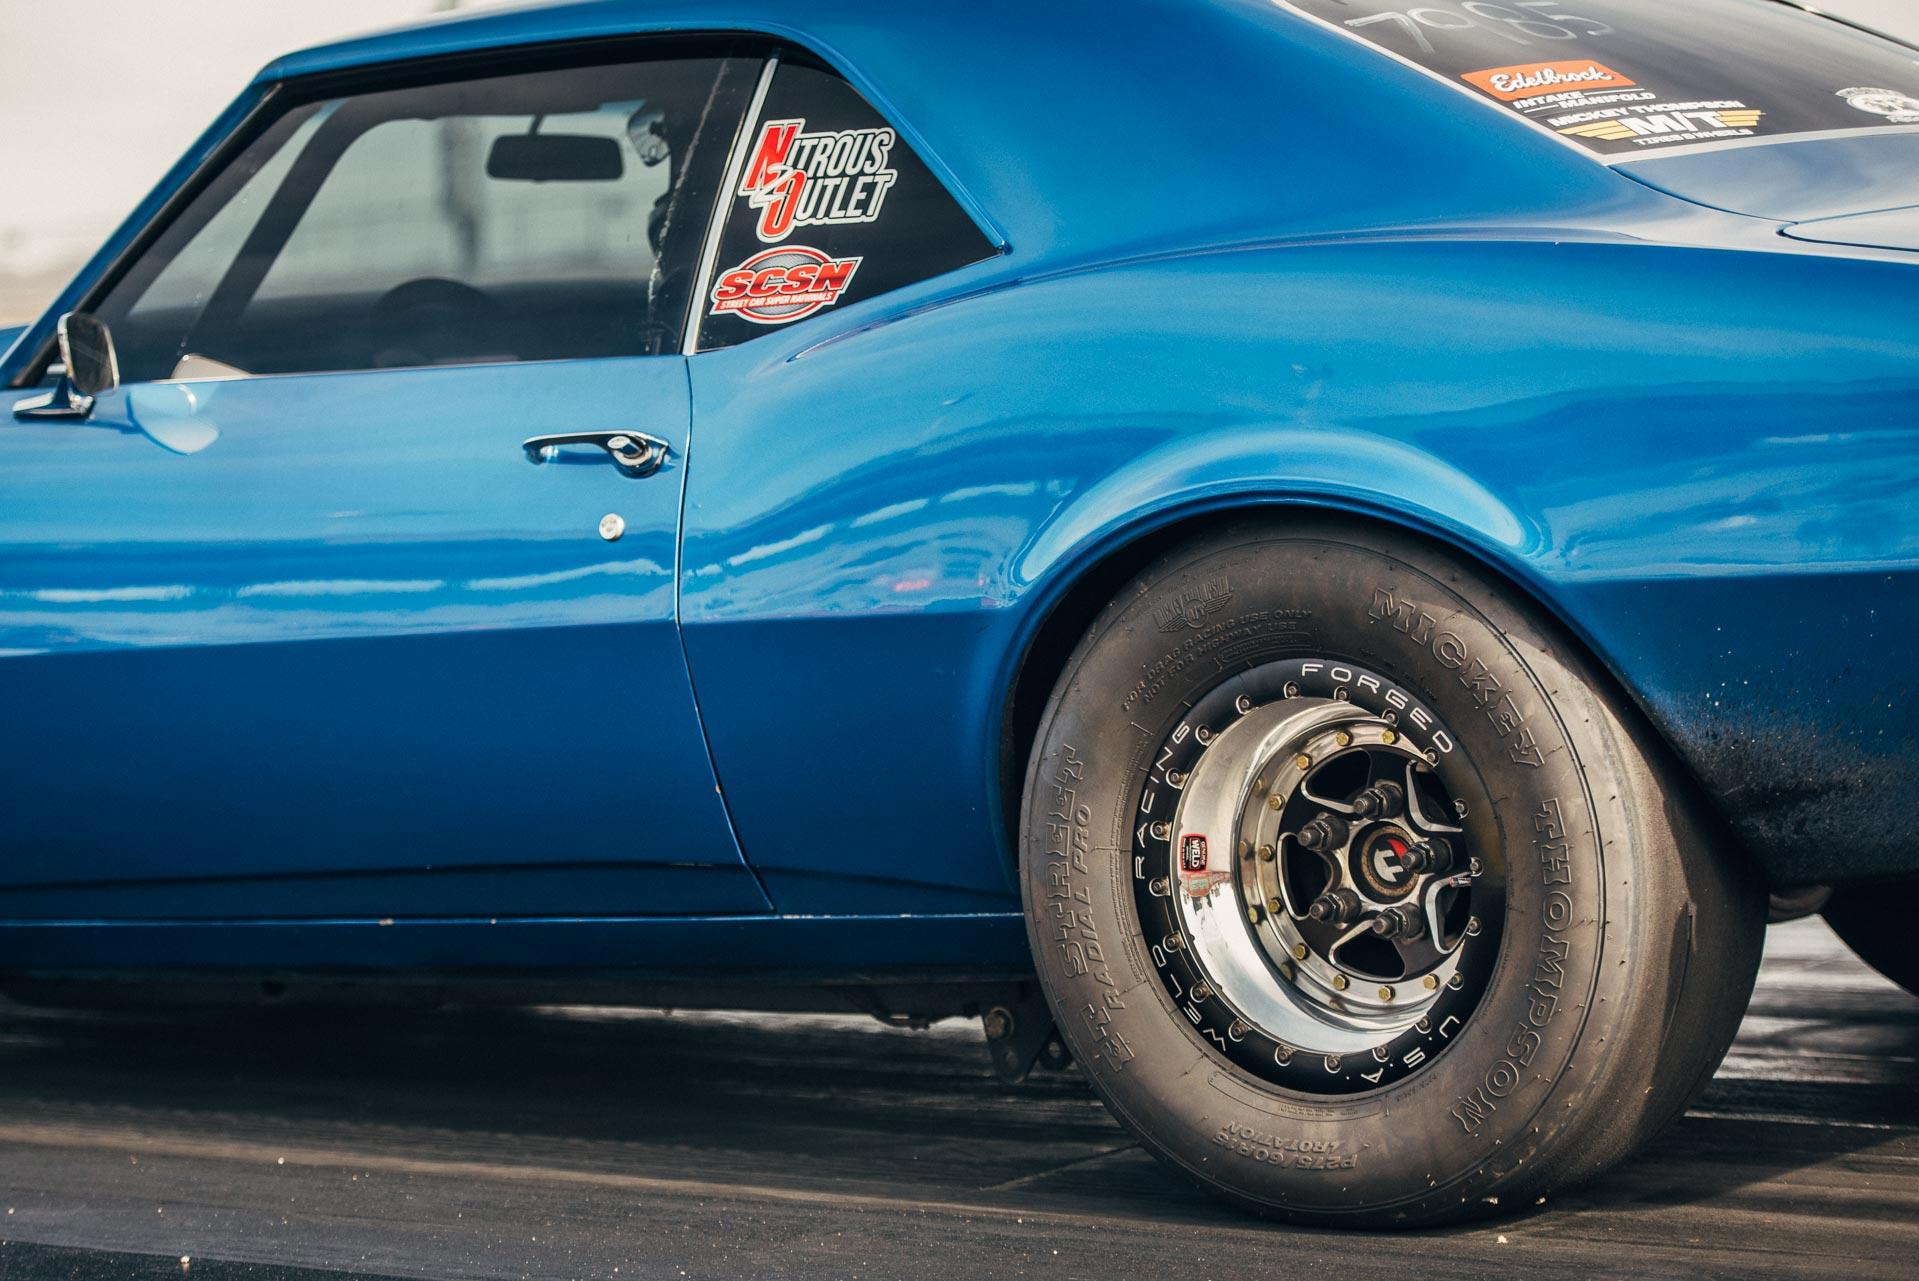 Radial Ply tires on a drag car